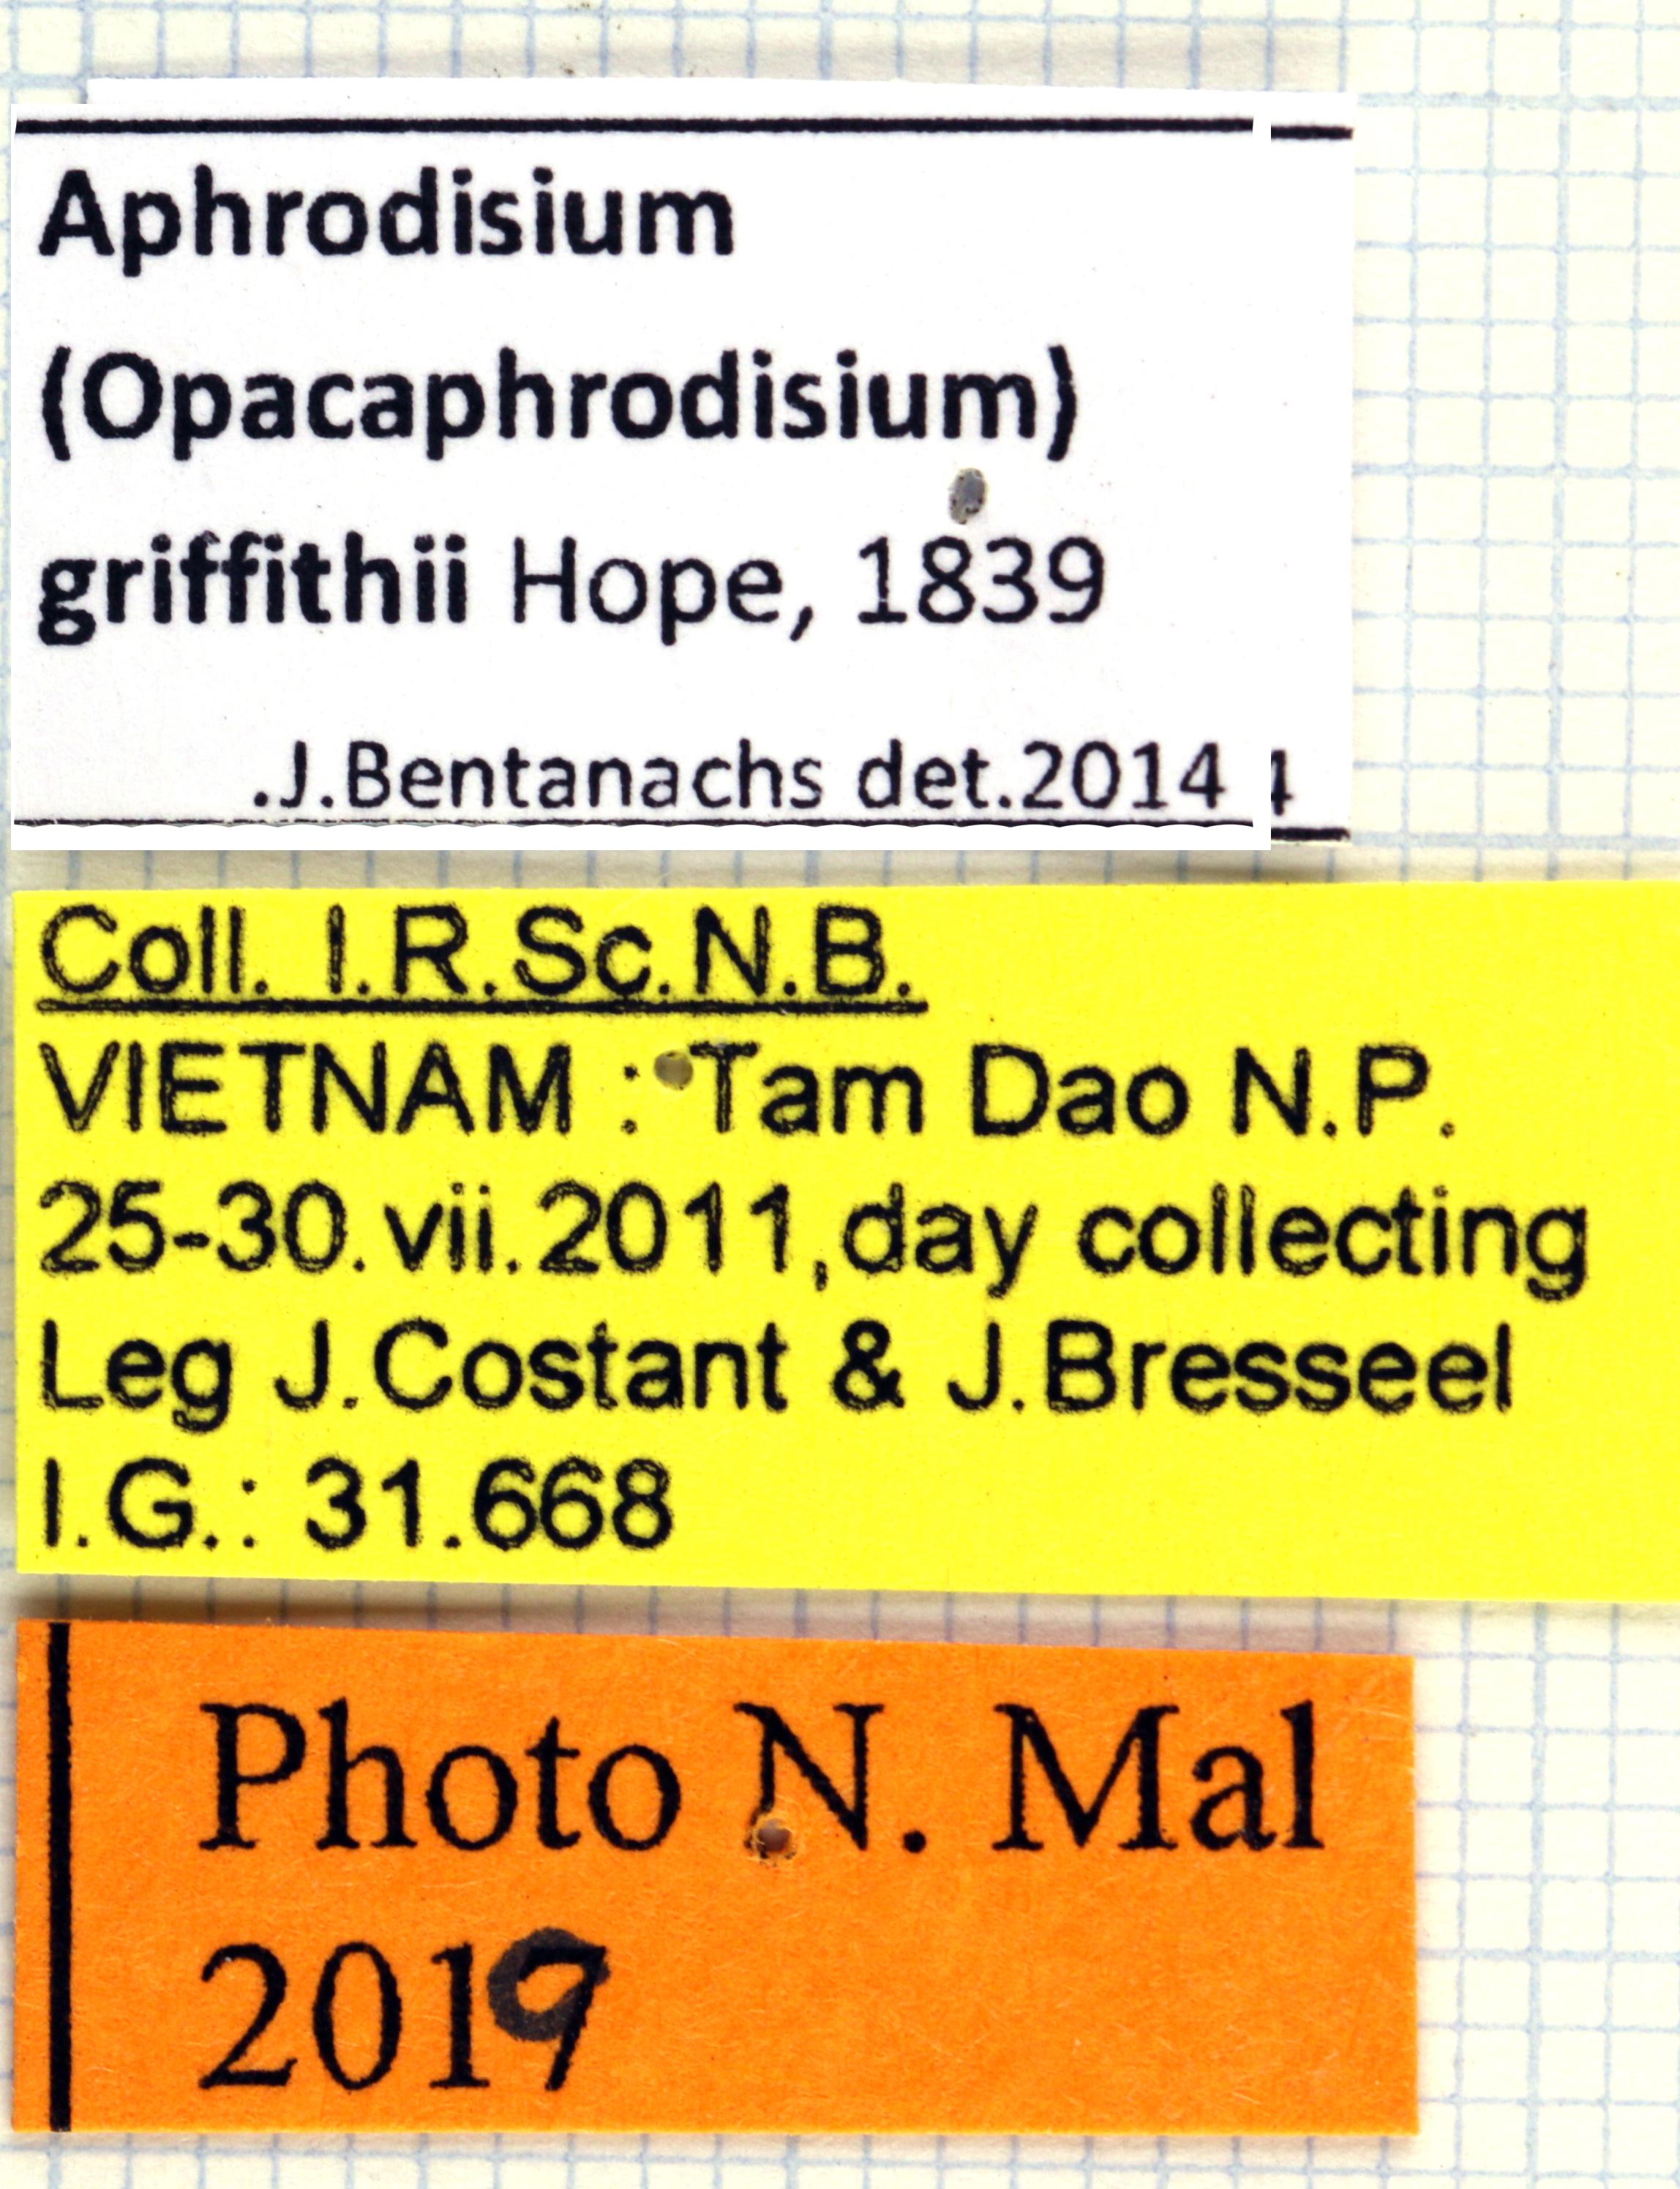 Aphrodisium (Opacaphrodisium) griffithi 13801.jpg